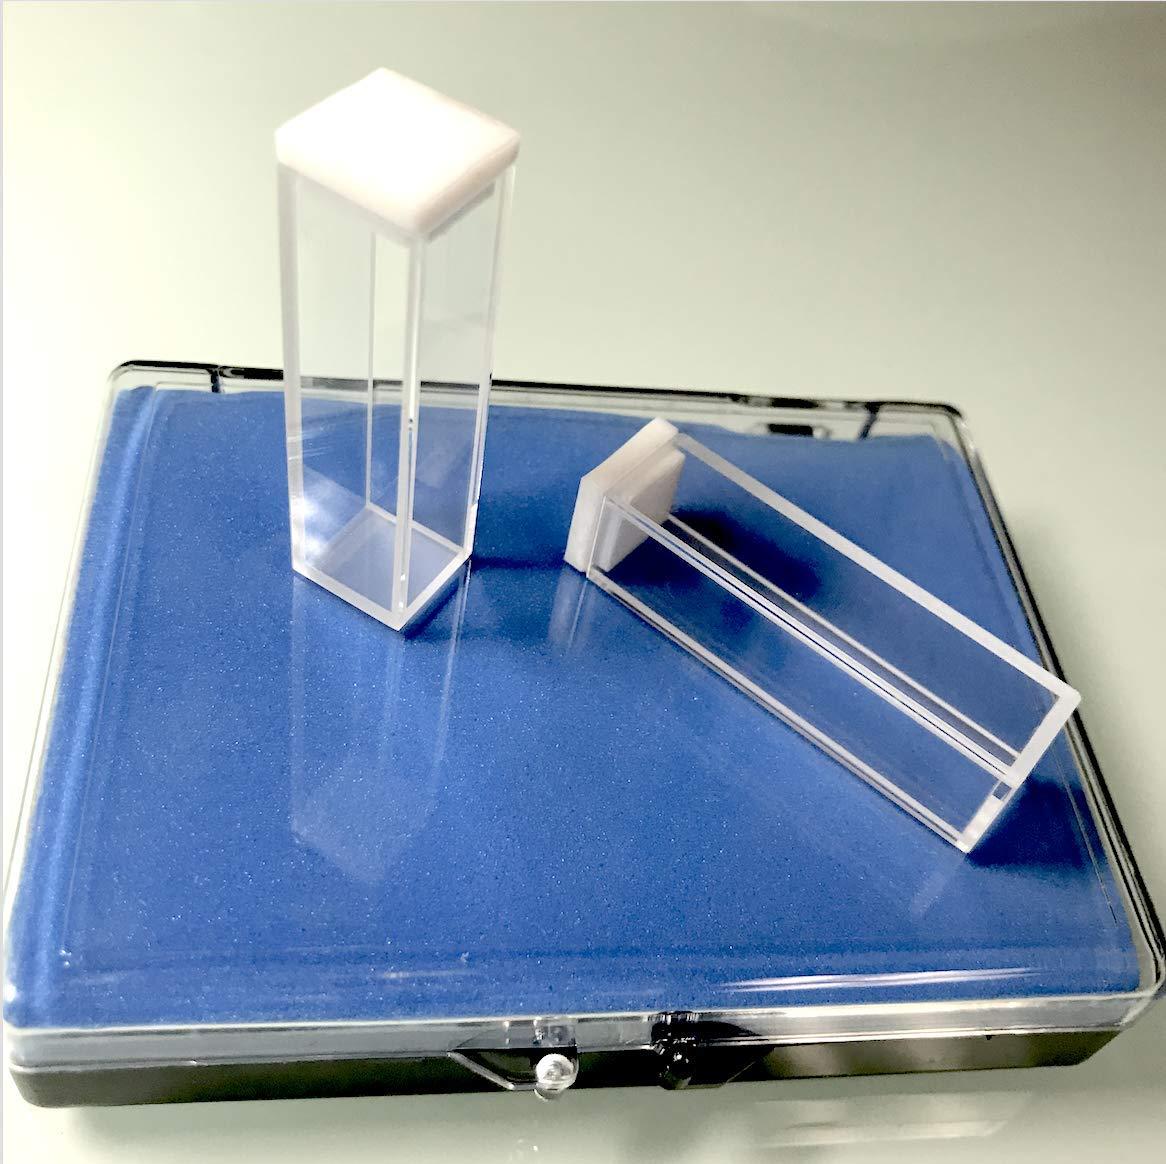 UV Quartz Cuvettes (Pathlength: 10 mm; Chamber Volume: 3.5 ml; Four-Sided Windows) (Qty: 2) by Alpha Nanotech Inc.